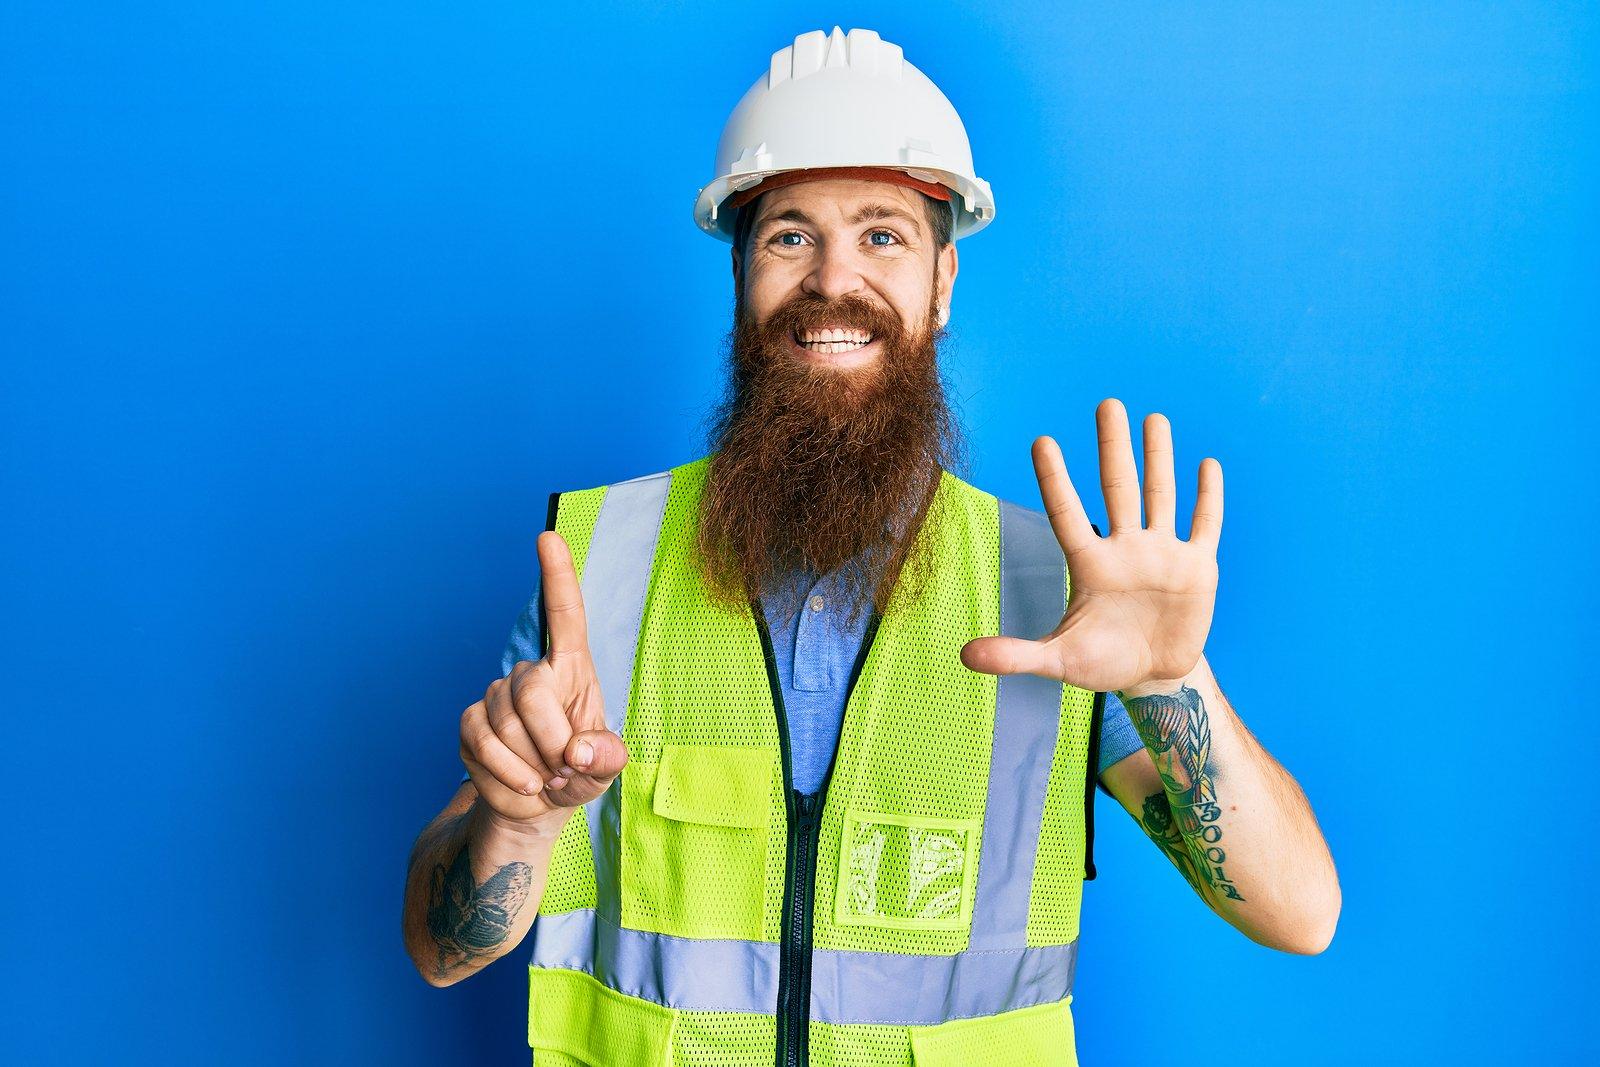 bigstock-Redhead-man-with-long-beard-we-417108145